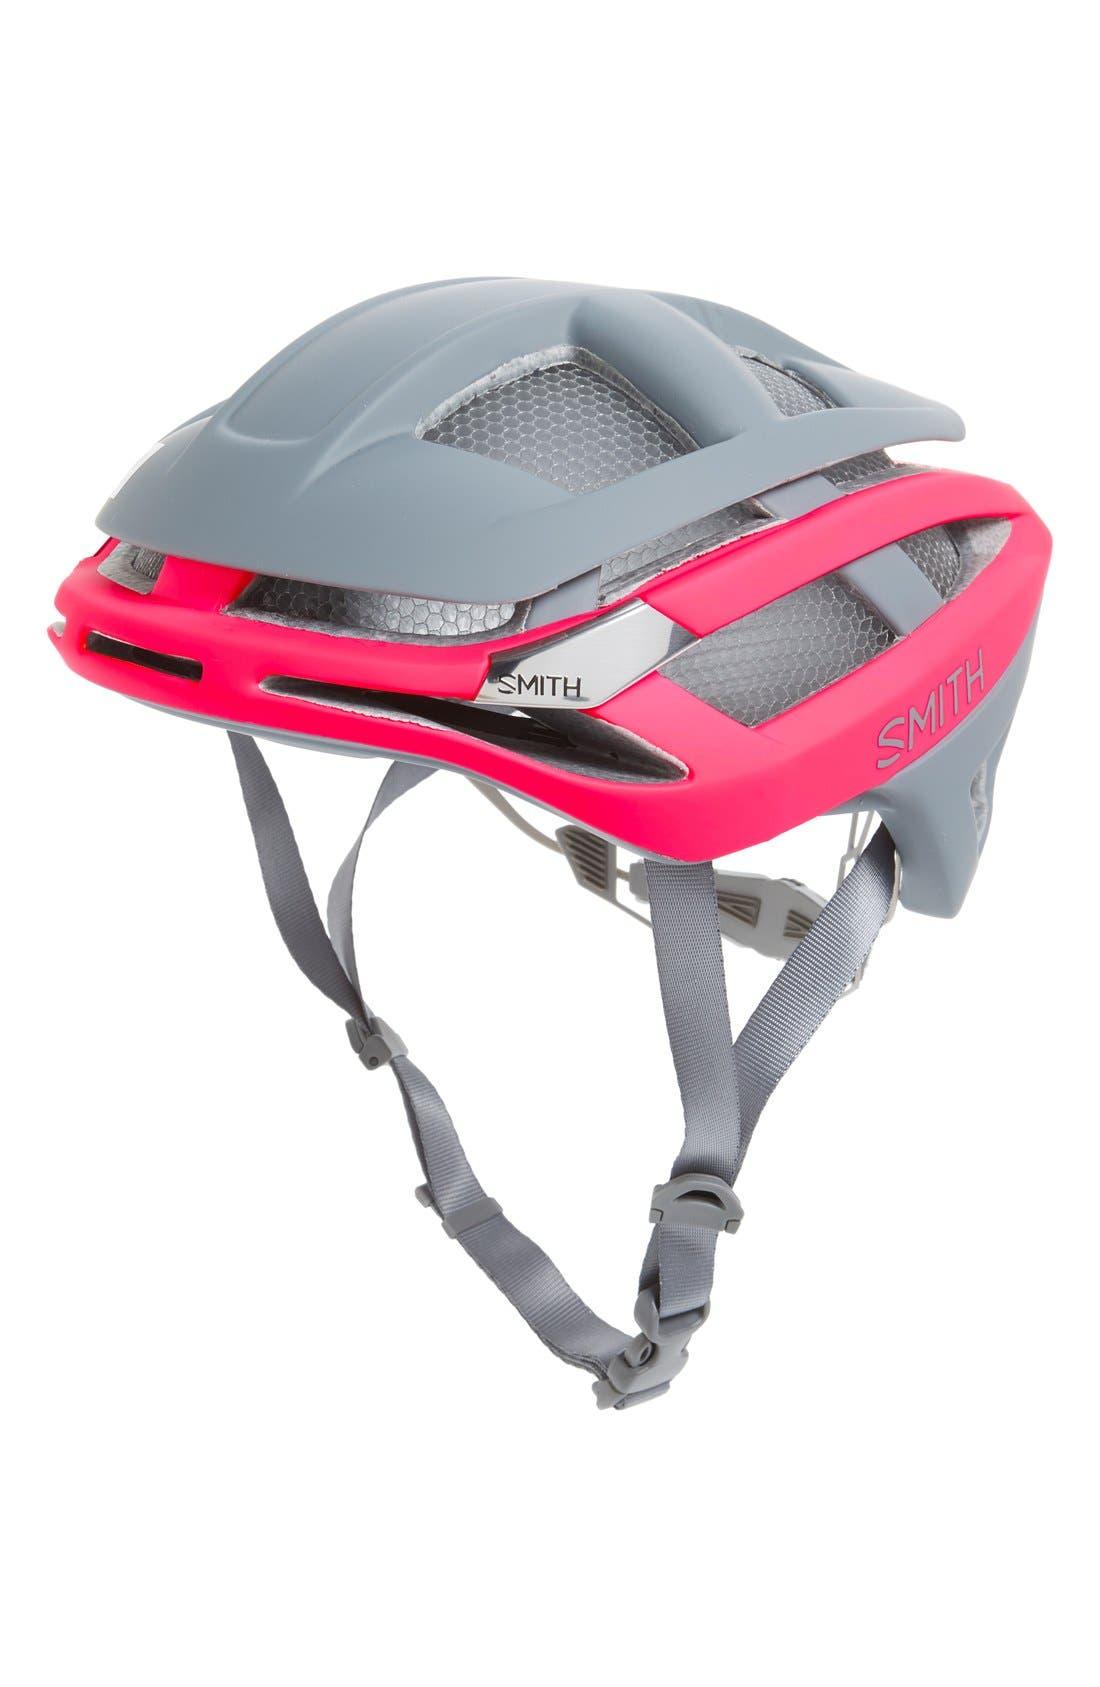 'Overtake With Aerocore(Tm) Featuring Koroyd' Biking Racer Helmet - Pink, Matte Pink/ Charcoal